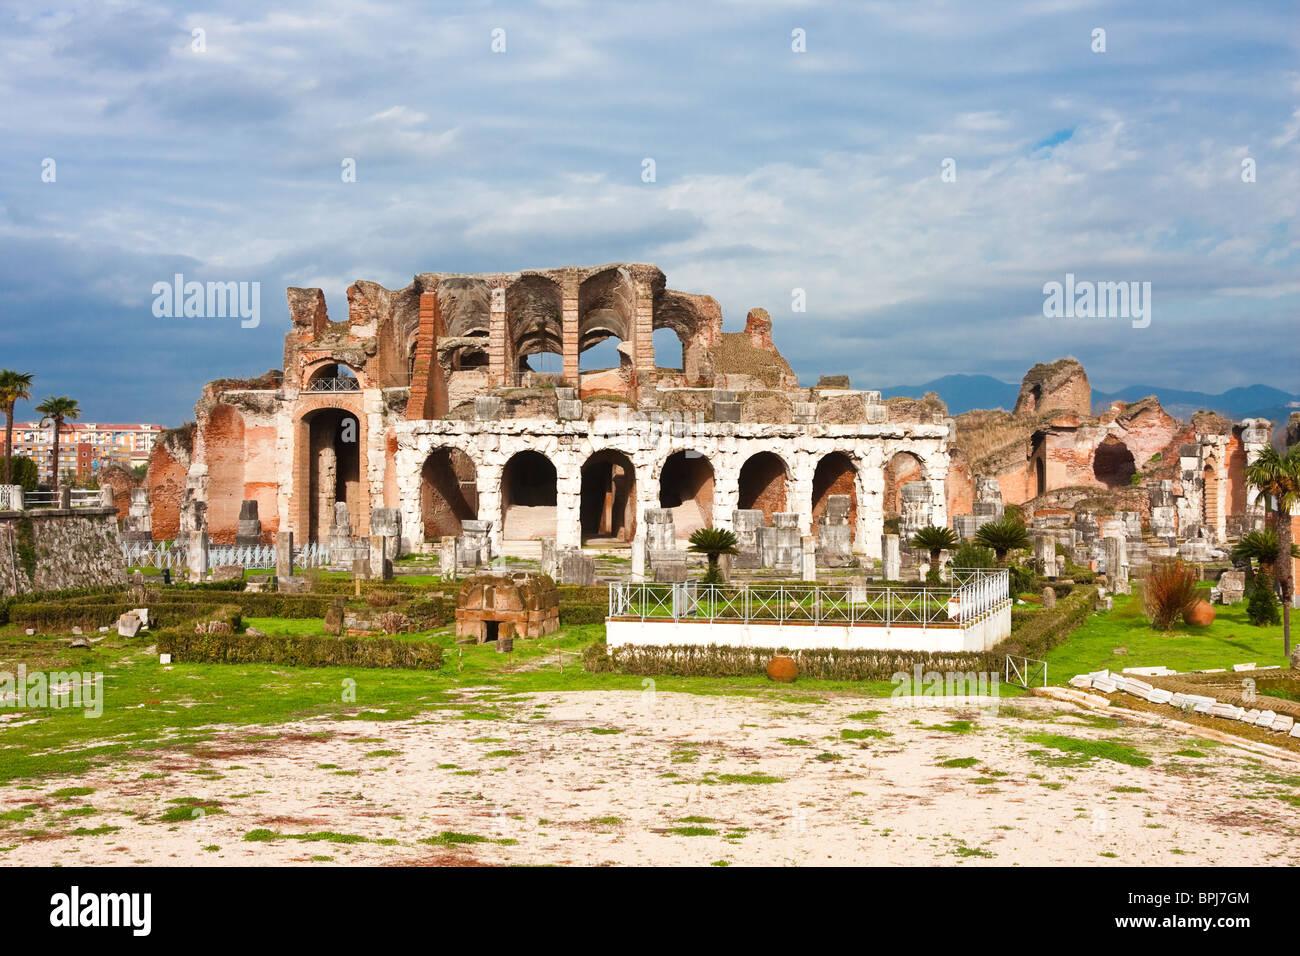 Santa maria capua vetere amphitheater in capua city italy - Piscina santa maria capua vetere ...